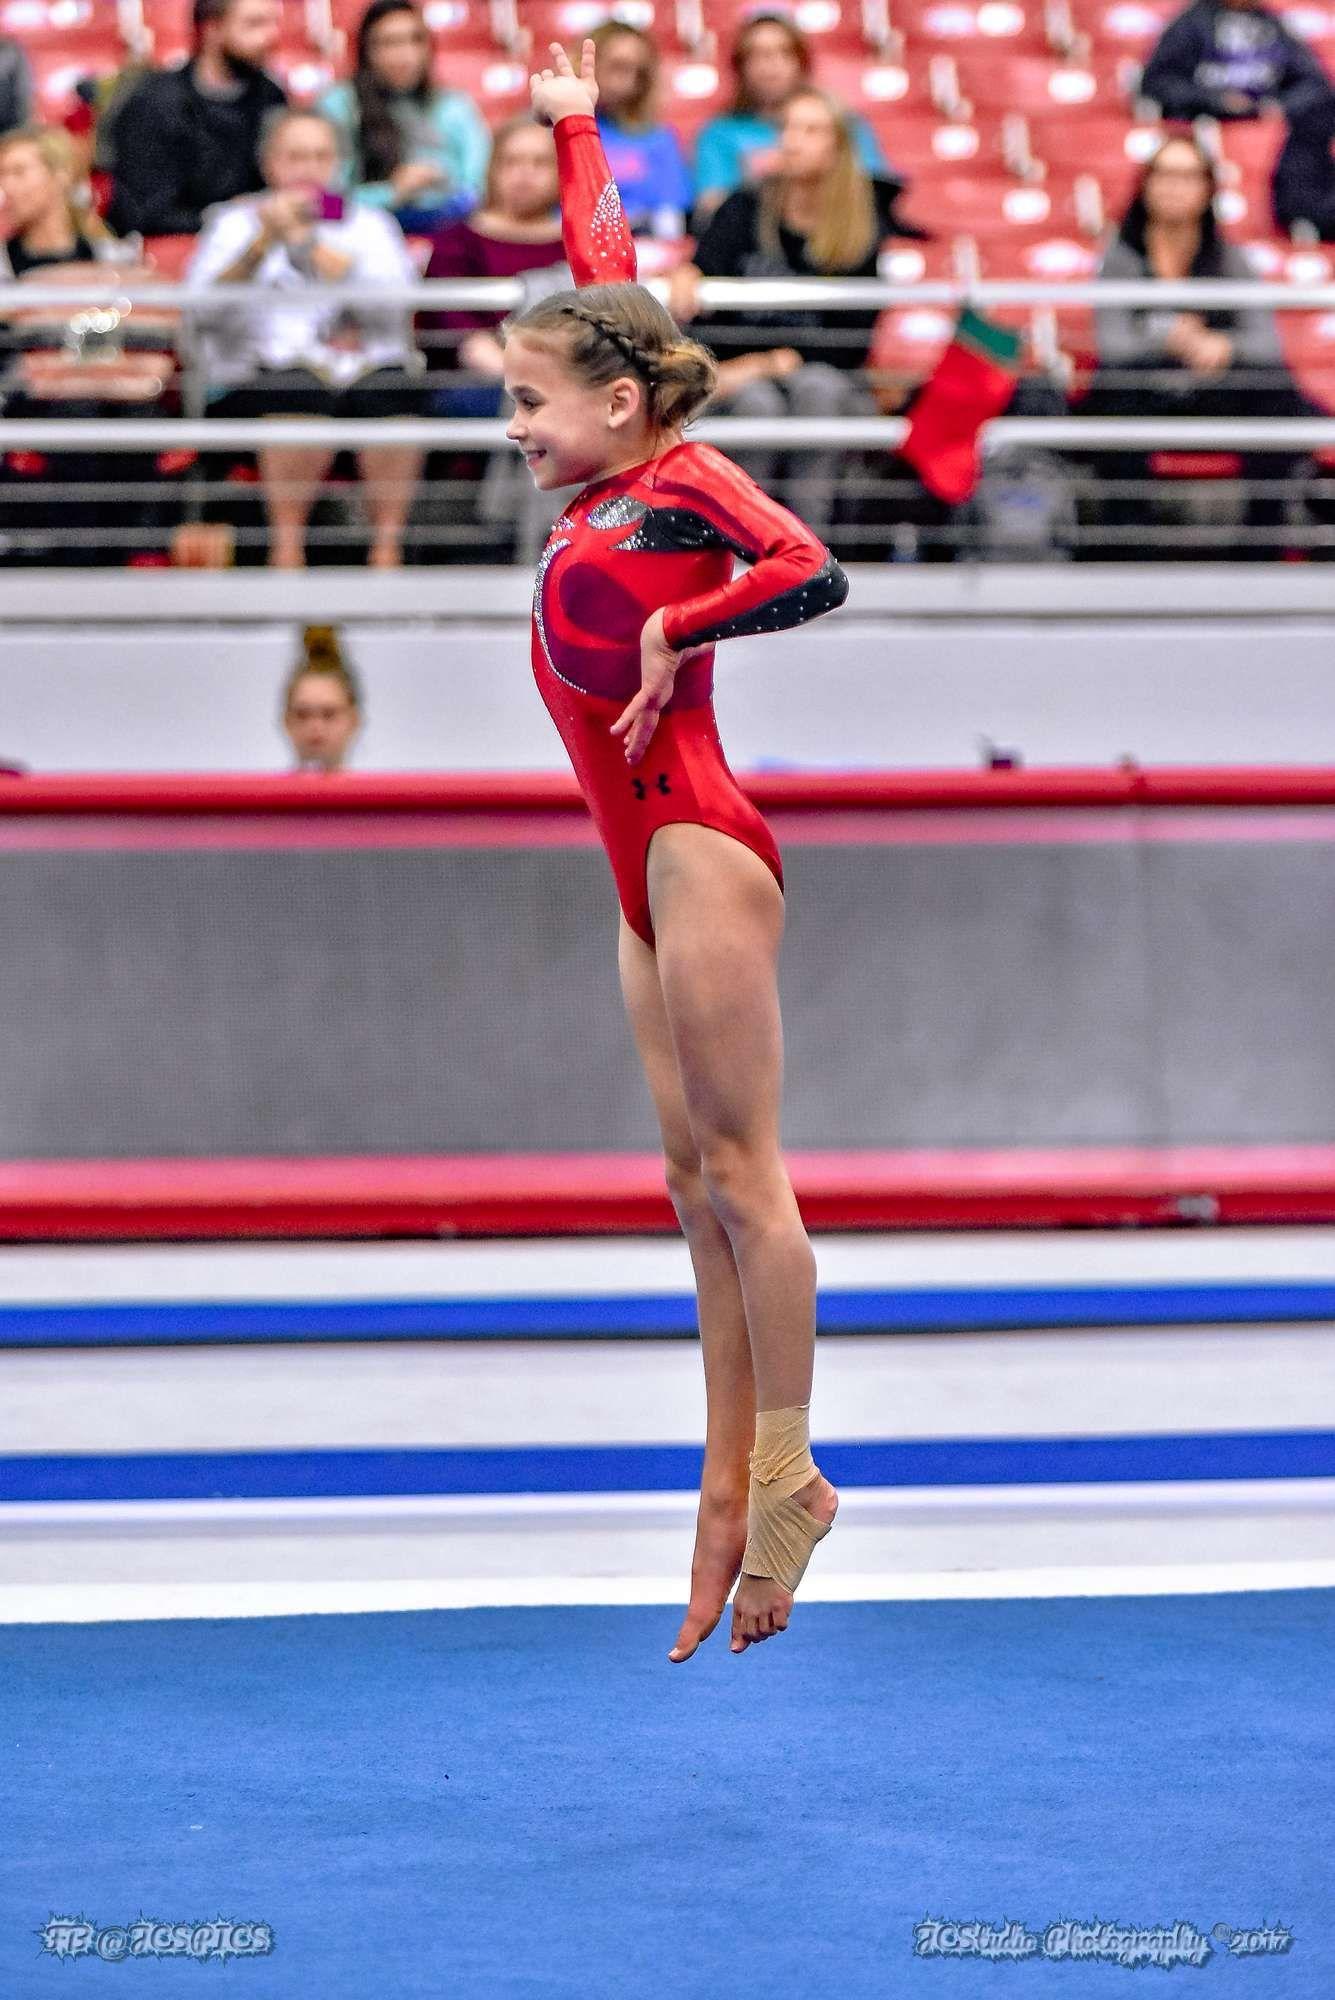 Fayetteville gymnastics meet 2017 gymnastics pictures